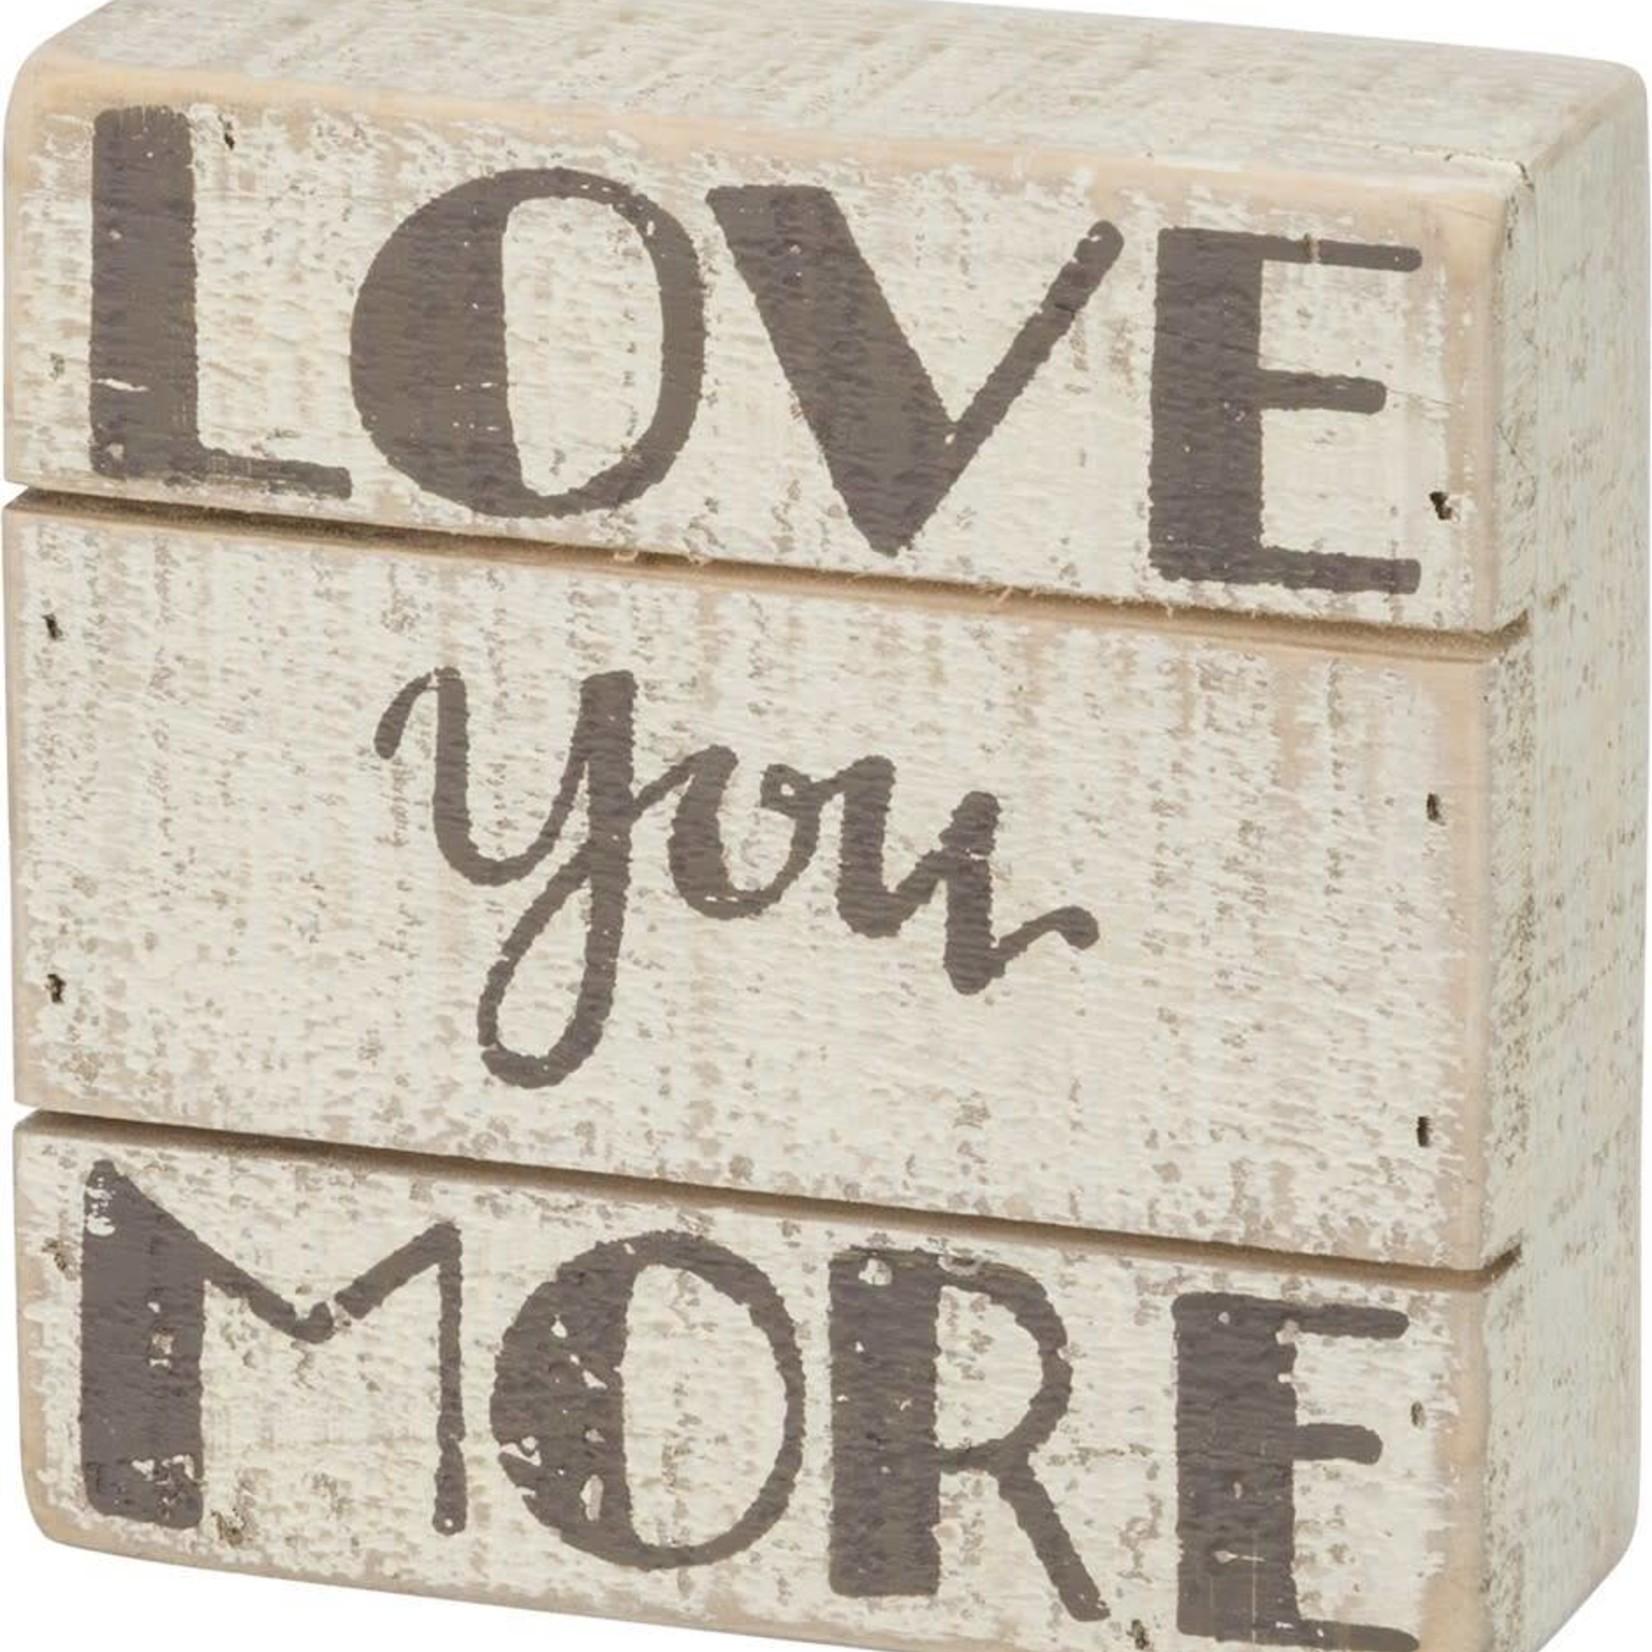 Slat Box Sign - Love You More 35230